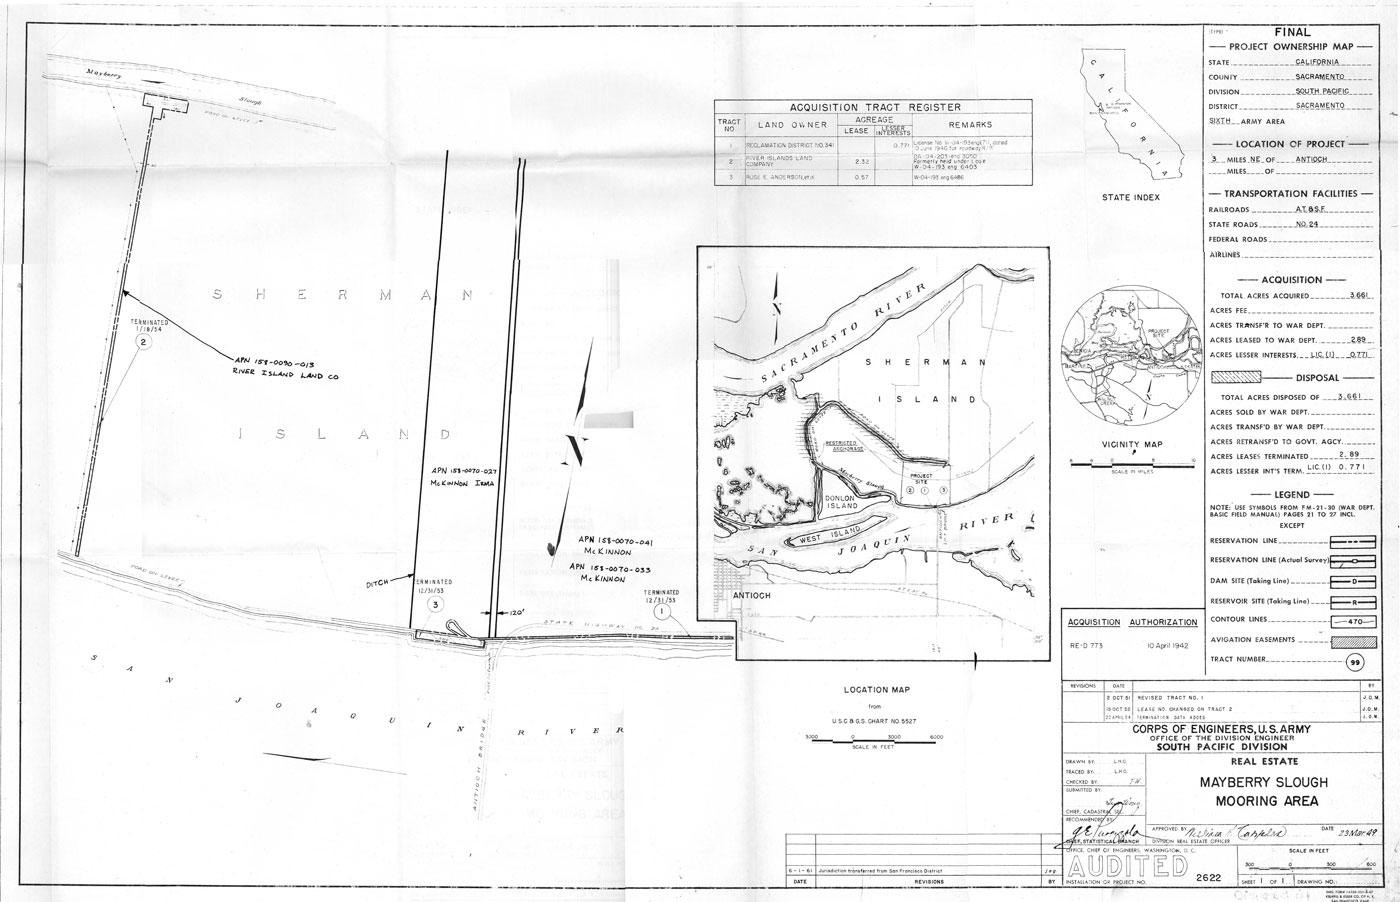 Mather Air Force Base Terminal Vhf Omni Range Tvor Annex